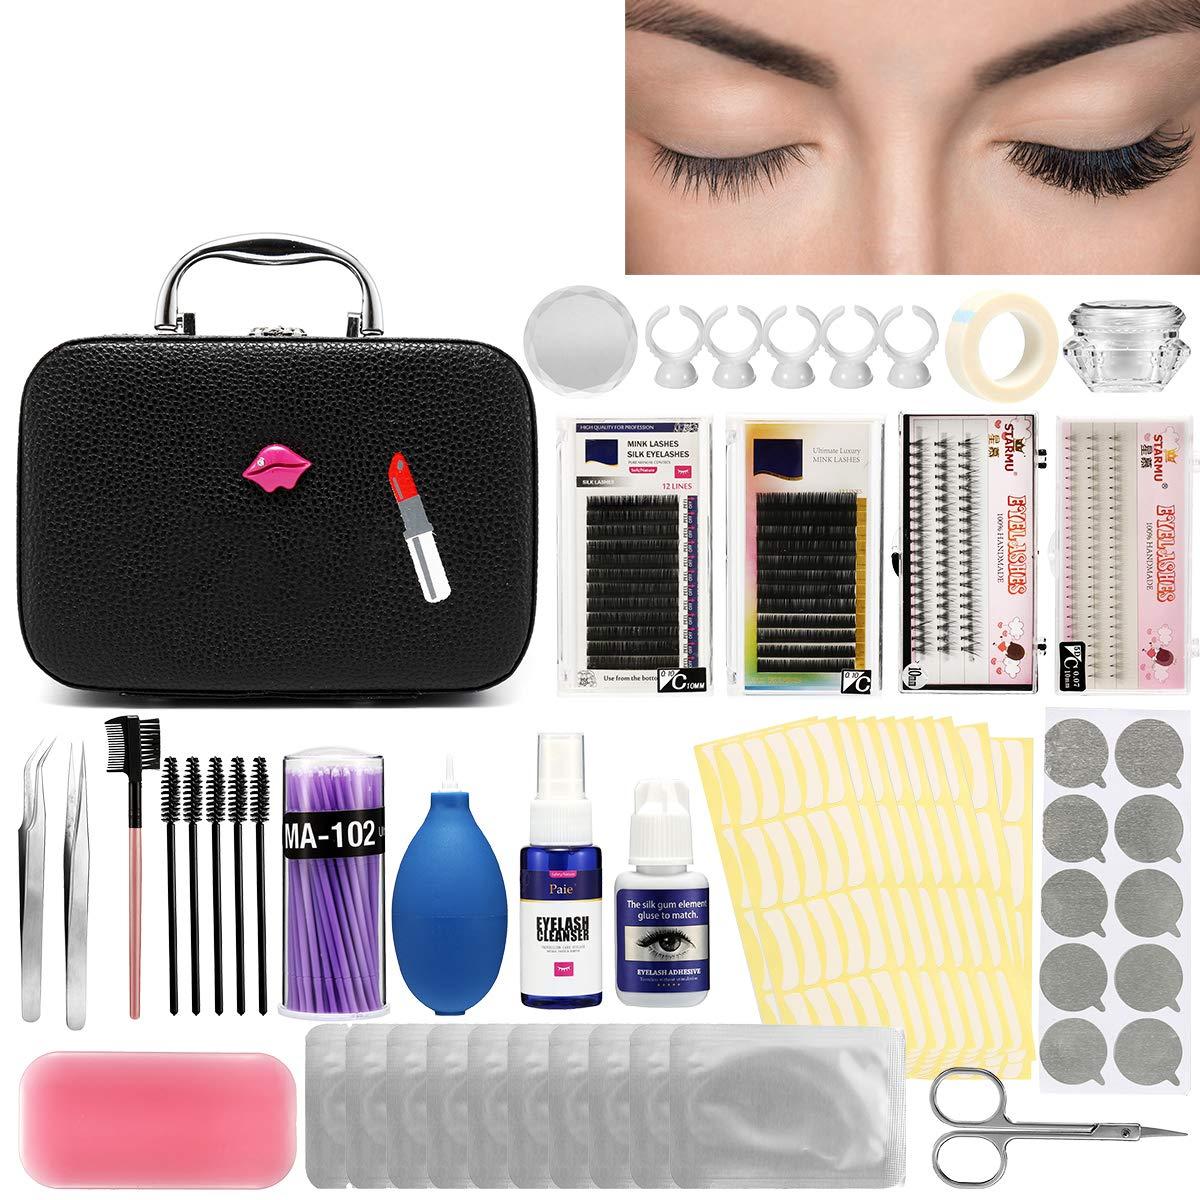 Luckyfine Pro 22pcs Eyelash Extension Kits False Lashes Tool Curl Glue With Cosmetic Case For Makeup Practice Eye Lashes Graft, Lash Starter Kit, Eyelashes Extension Practice Set